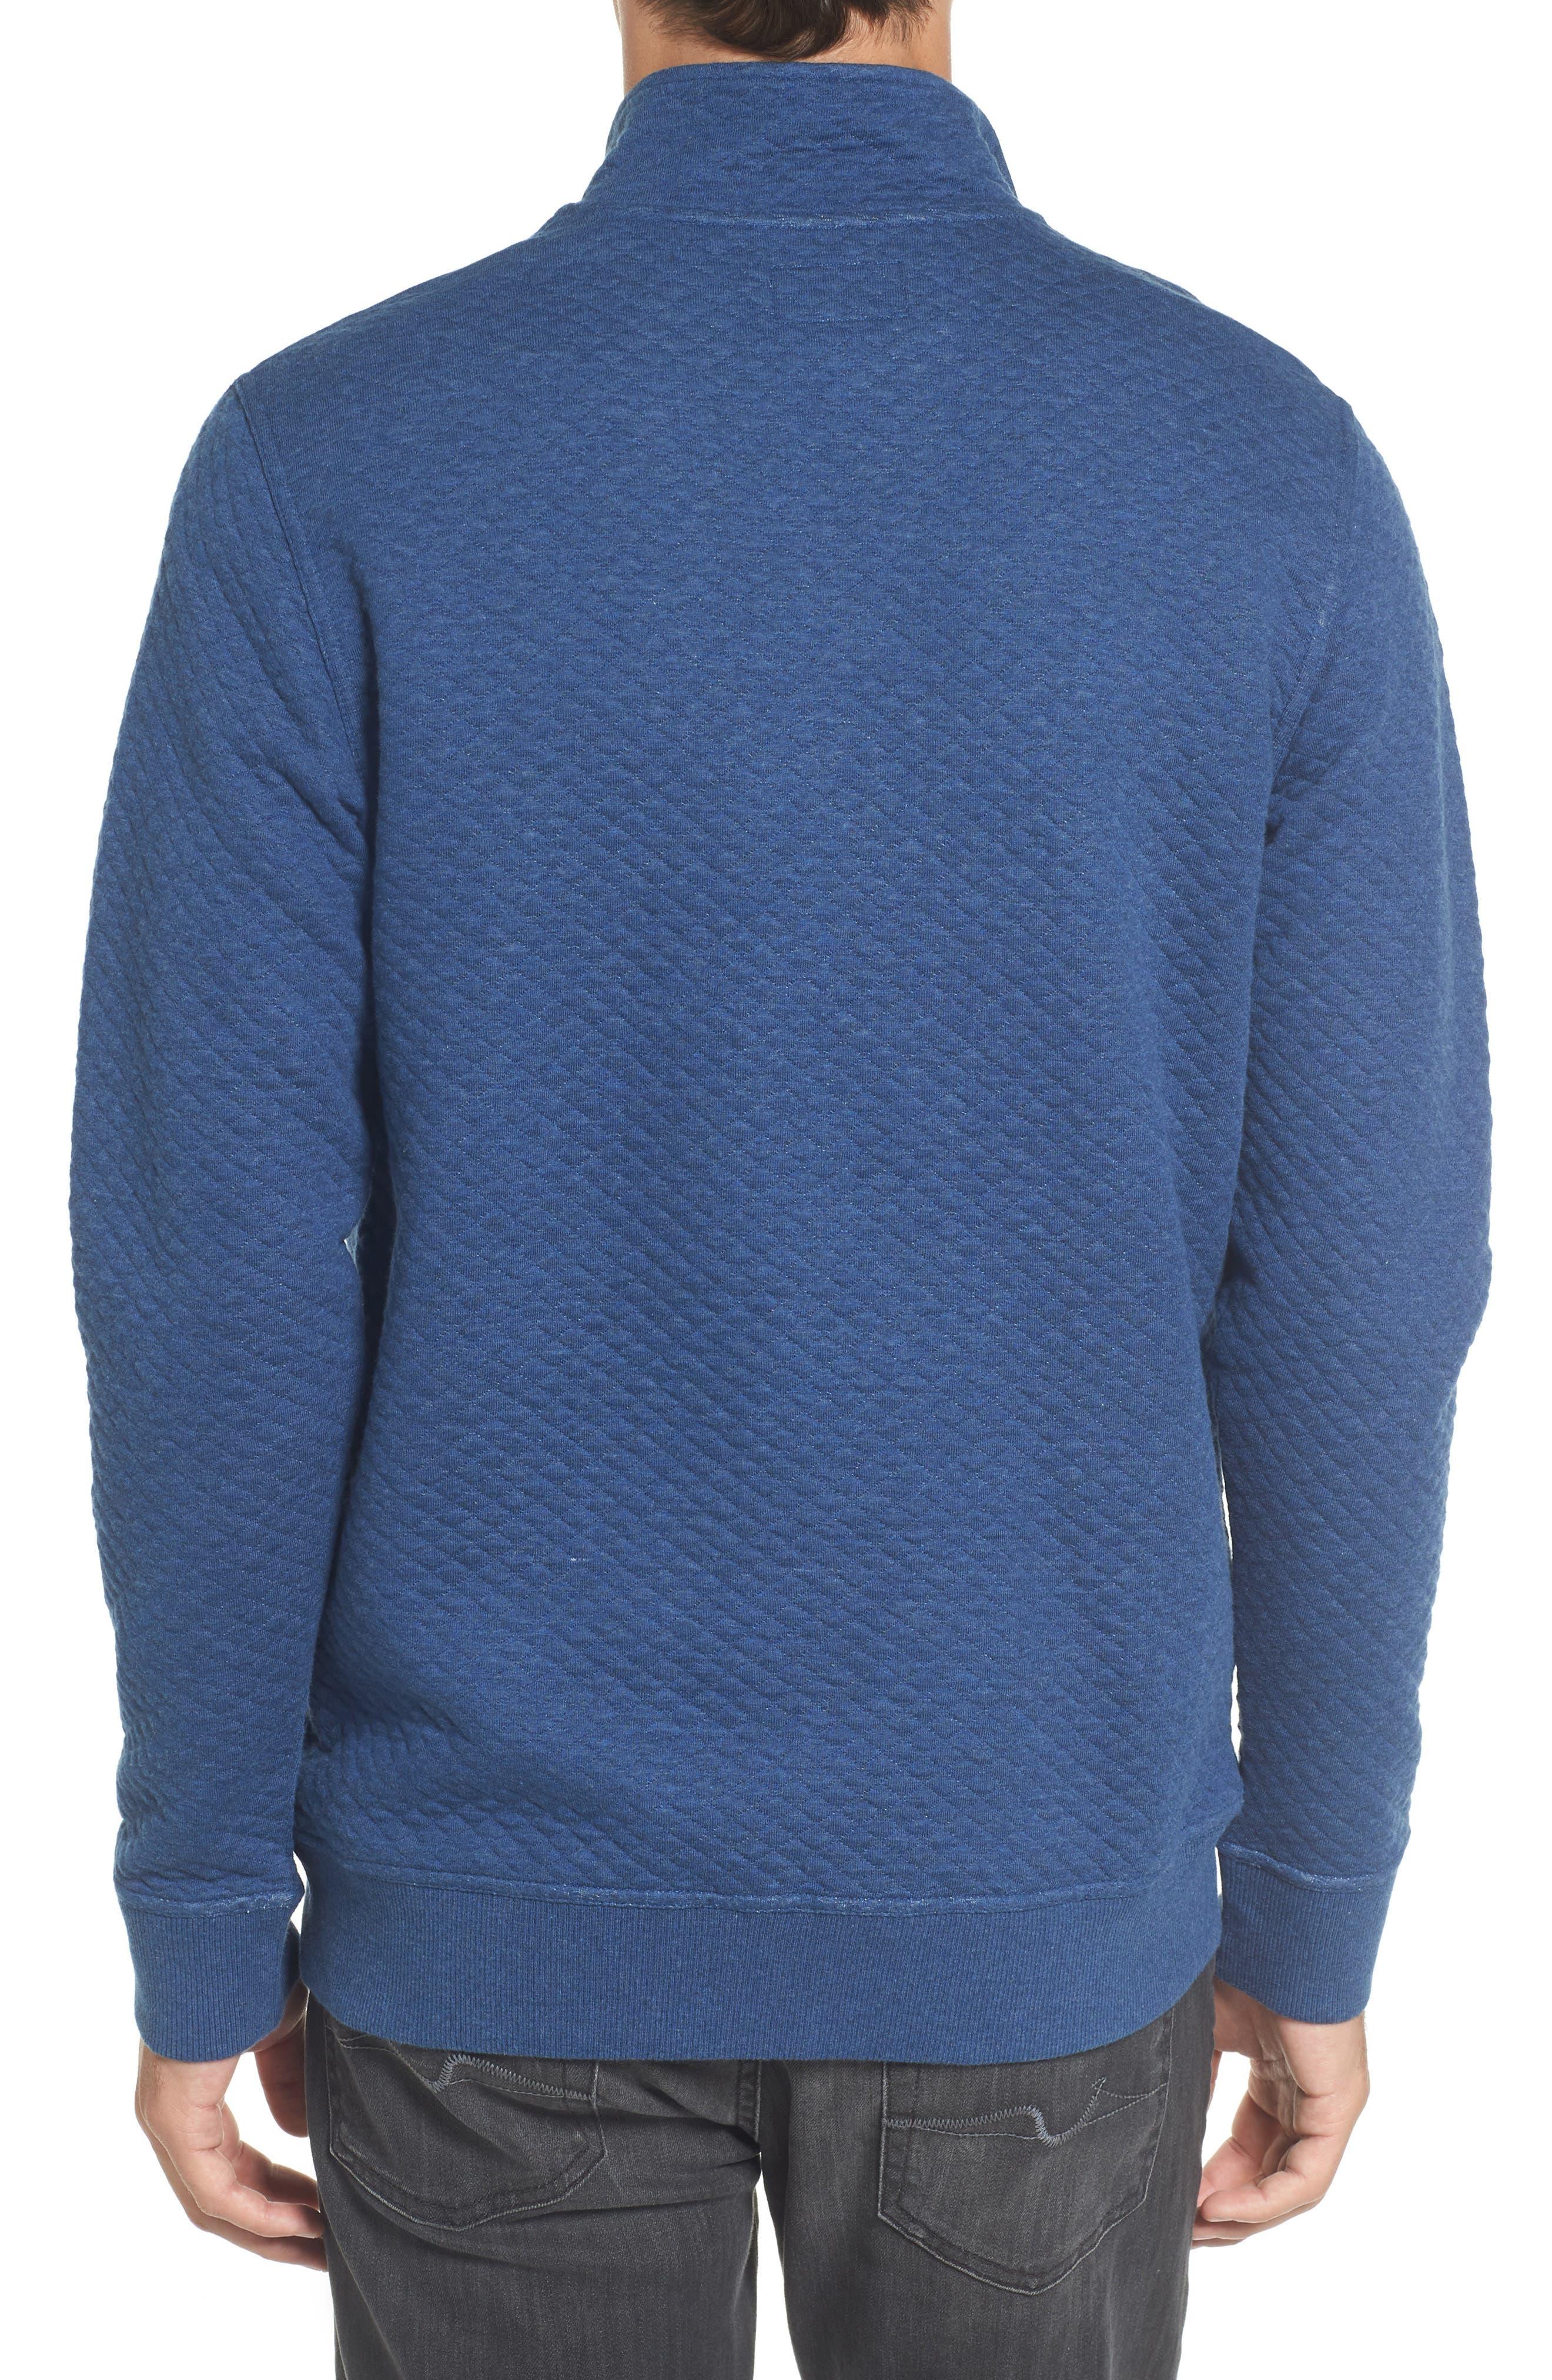 Sundown Quilted Quarter Zip Pullover,                             Alternate thumbnail 2, color,                             Skipper Blue